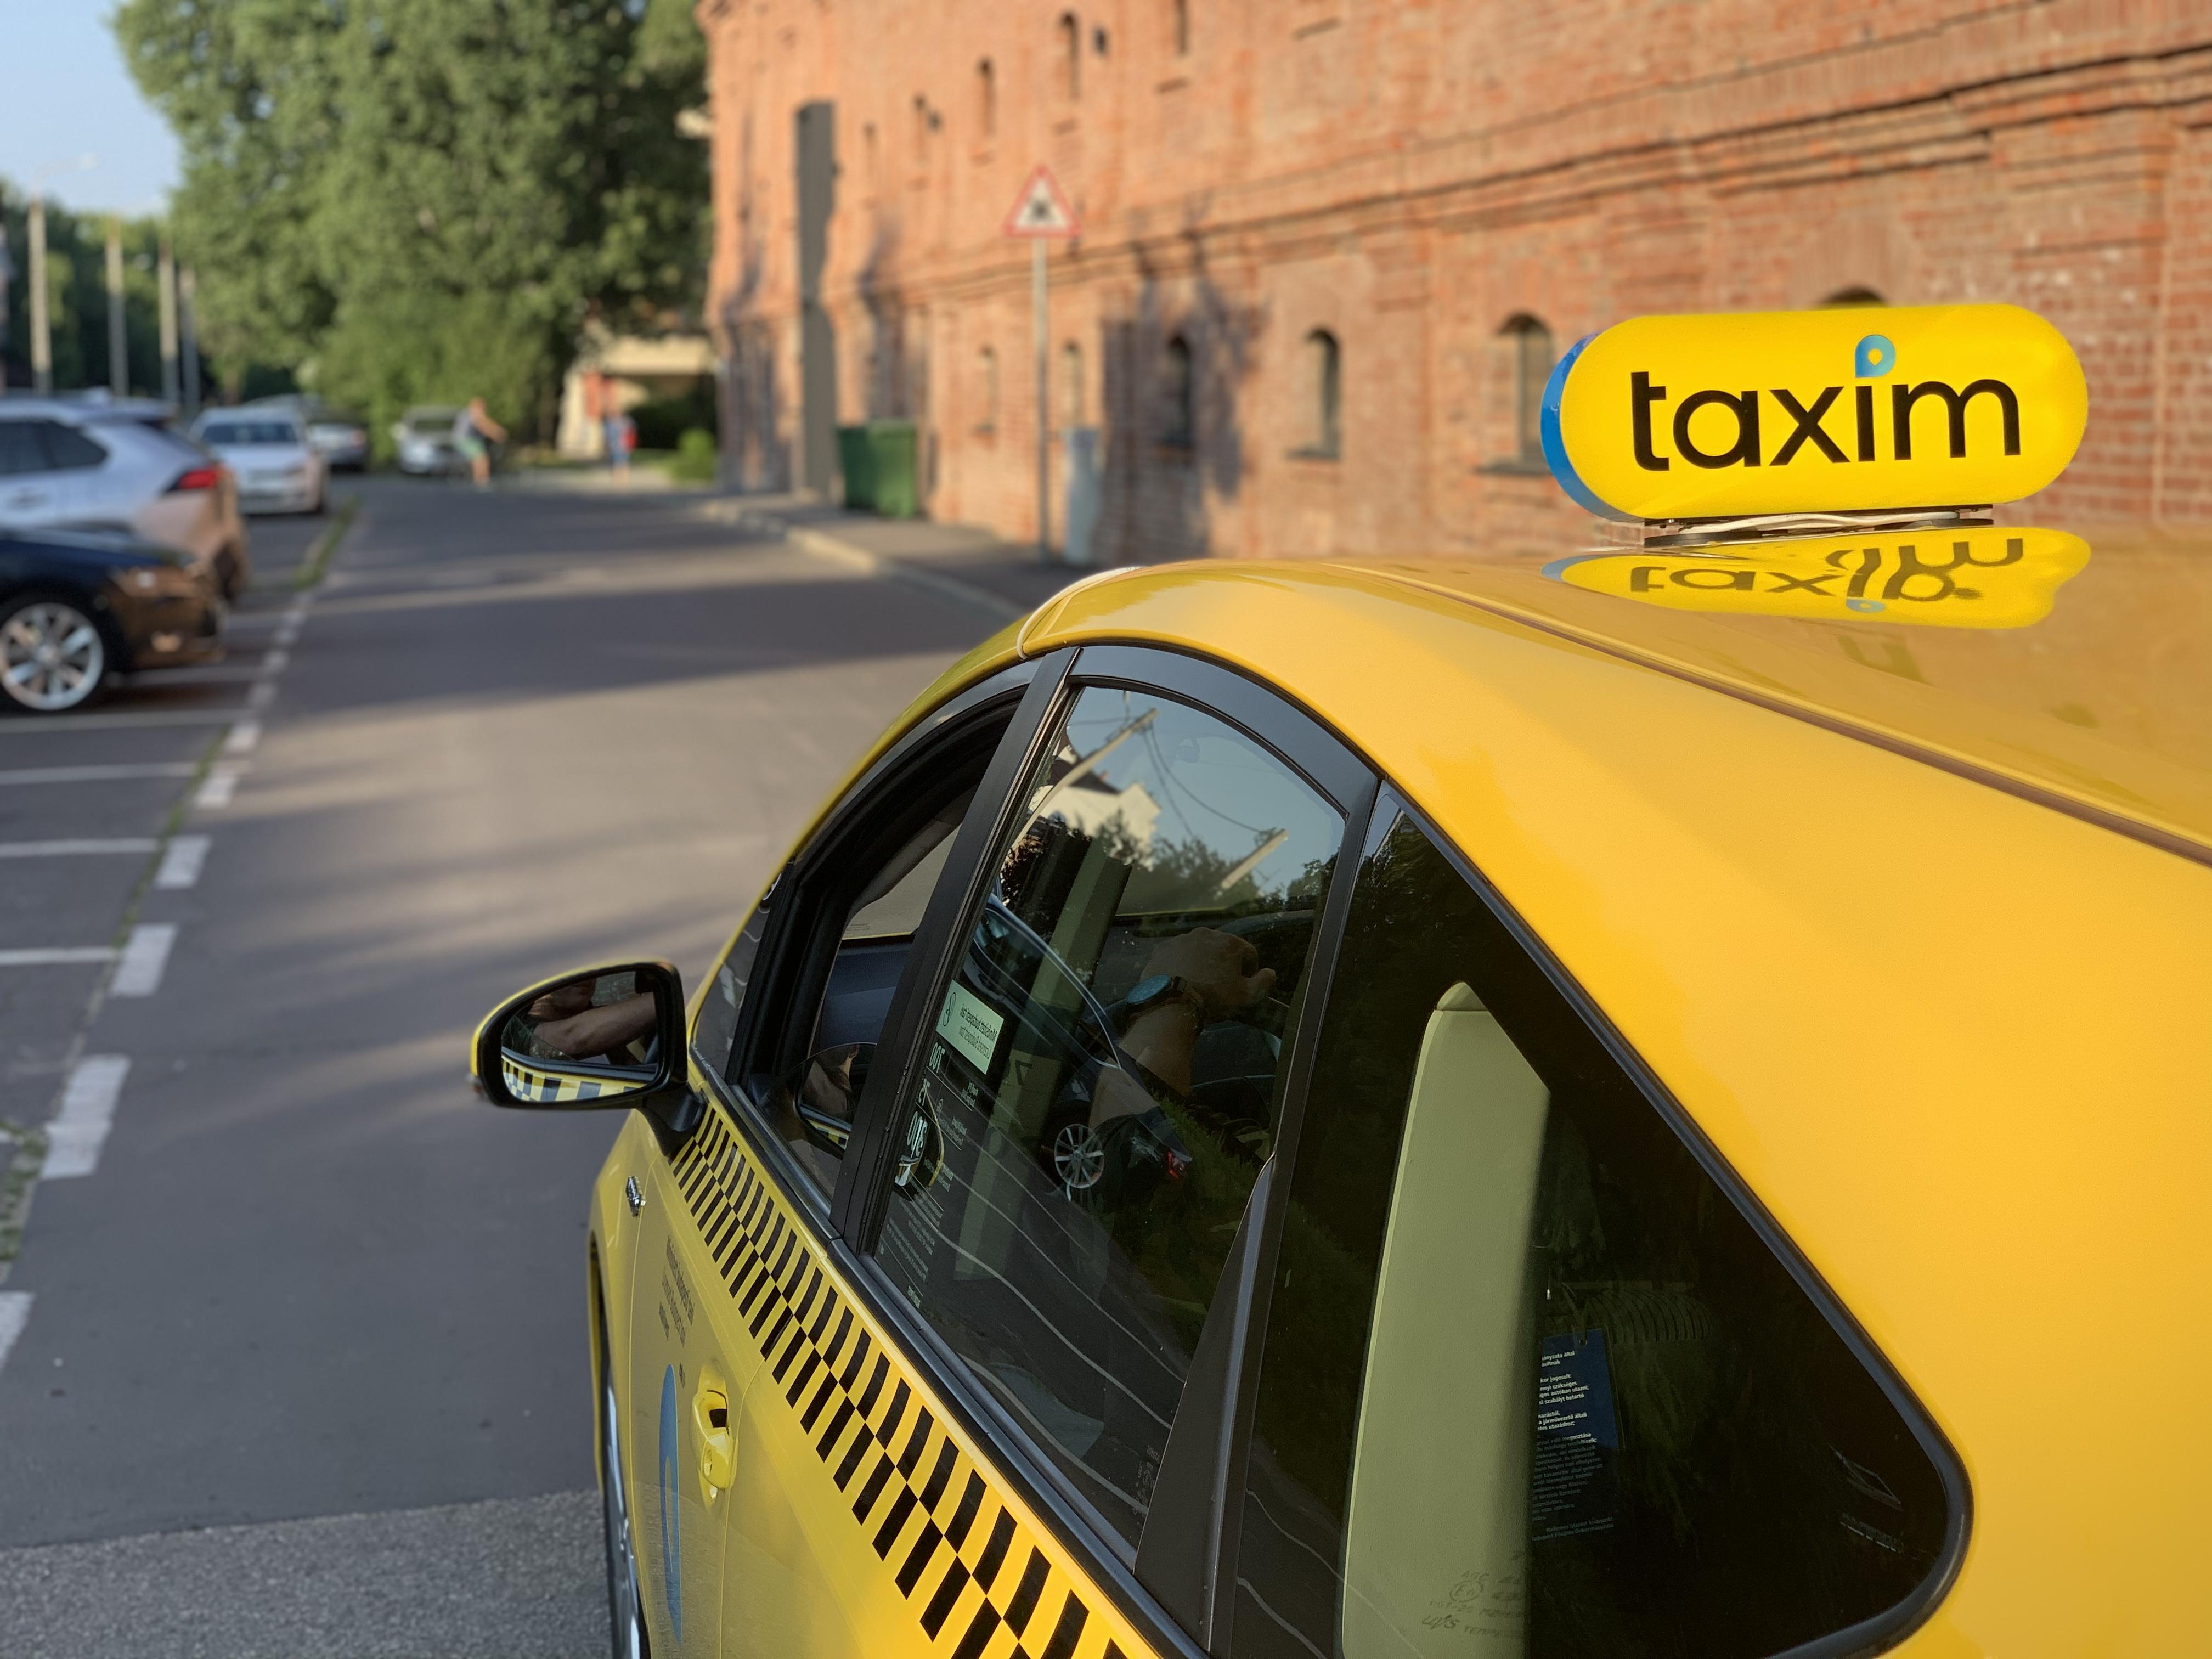 Már adományt is gyűjthet, aki a Taximmal az innovatív magyar taxis appal utazik